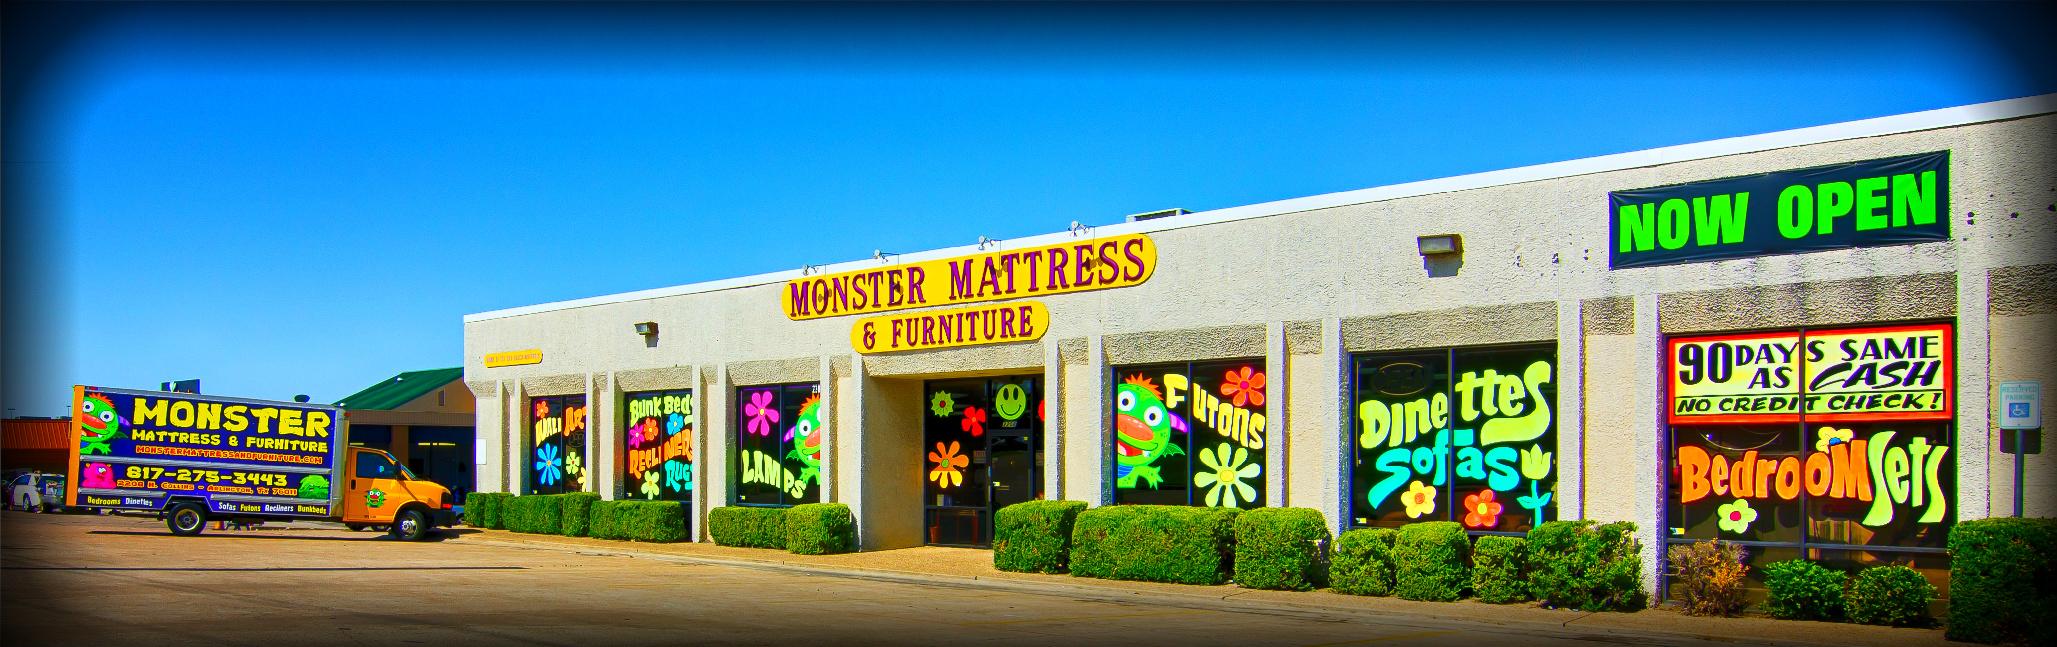 monstermattressandfurniture image 3